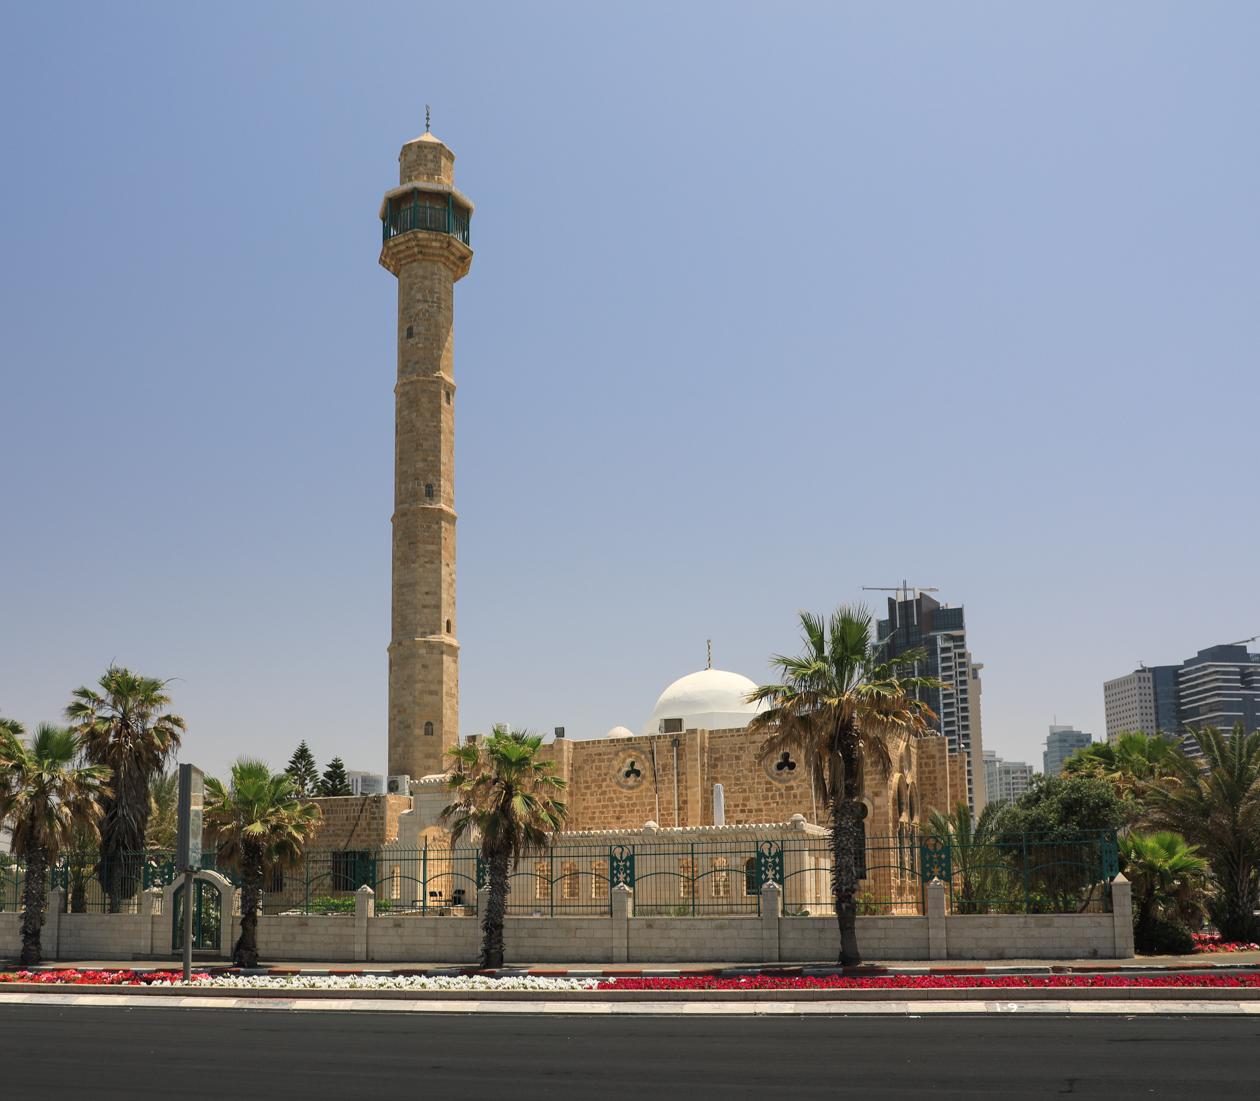 tel-aviv-hassan-bek-moskee